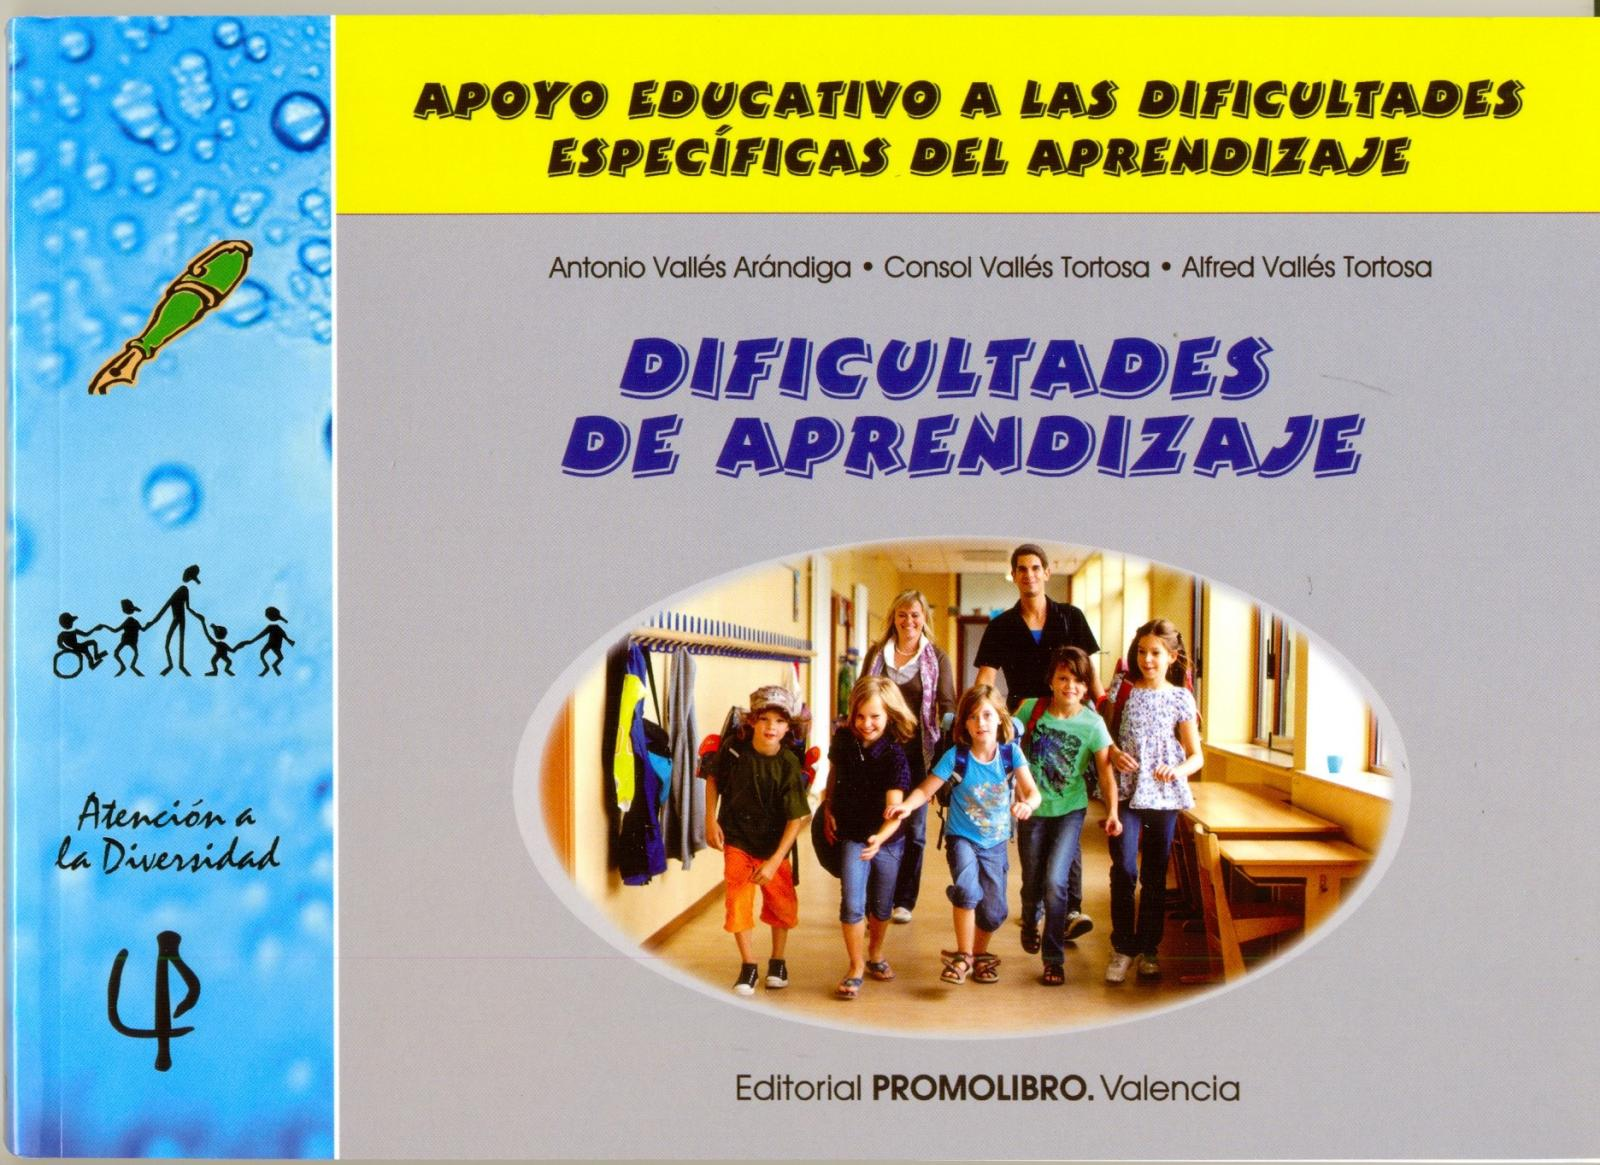 213.- DIFICULTADES DE APRENDIZAJE. Apoyo educativo a las dificultades específicas del aprendizaje.